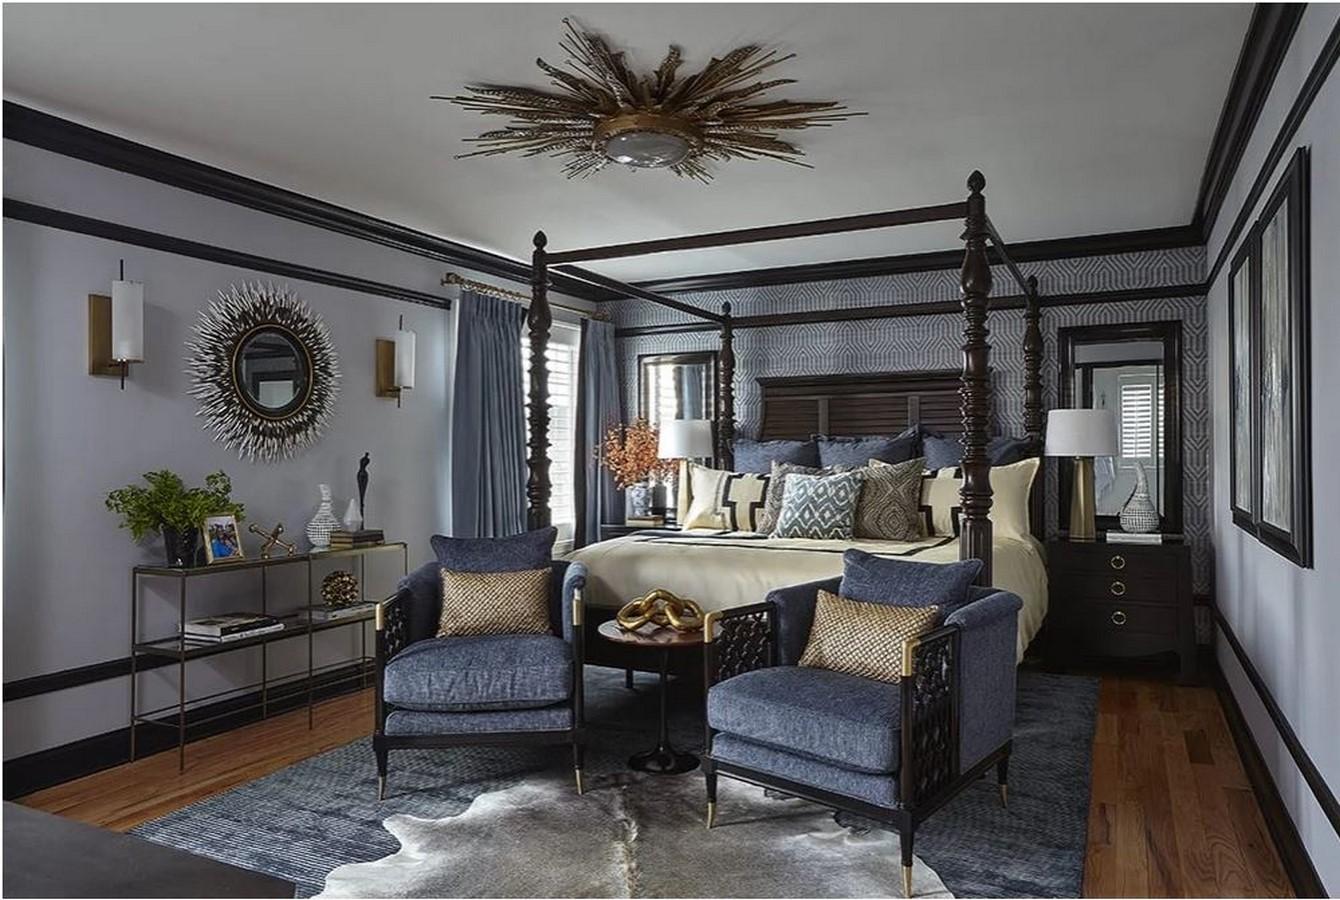 Tiffany Brooks Interiors- 15 Iconic Projects - Sheet5